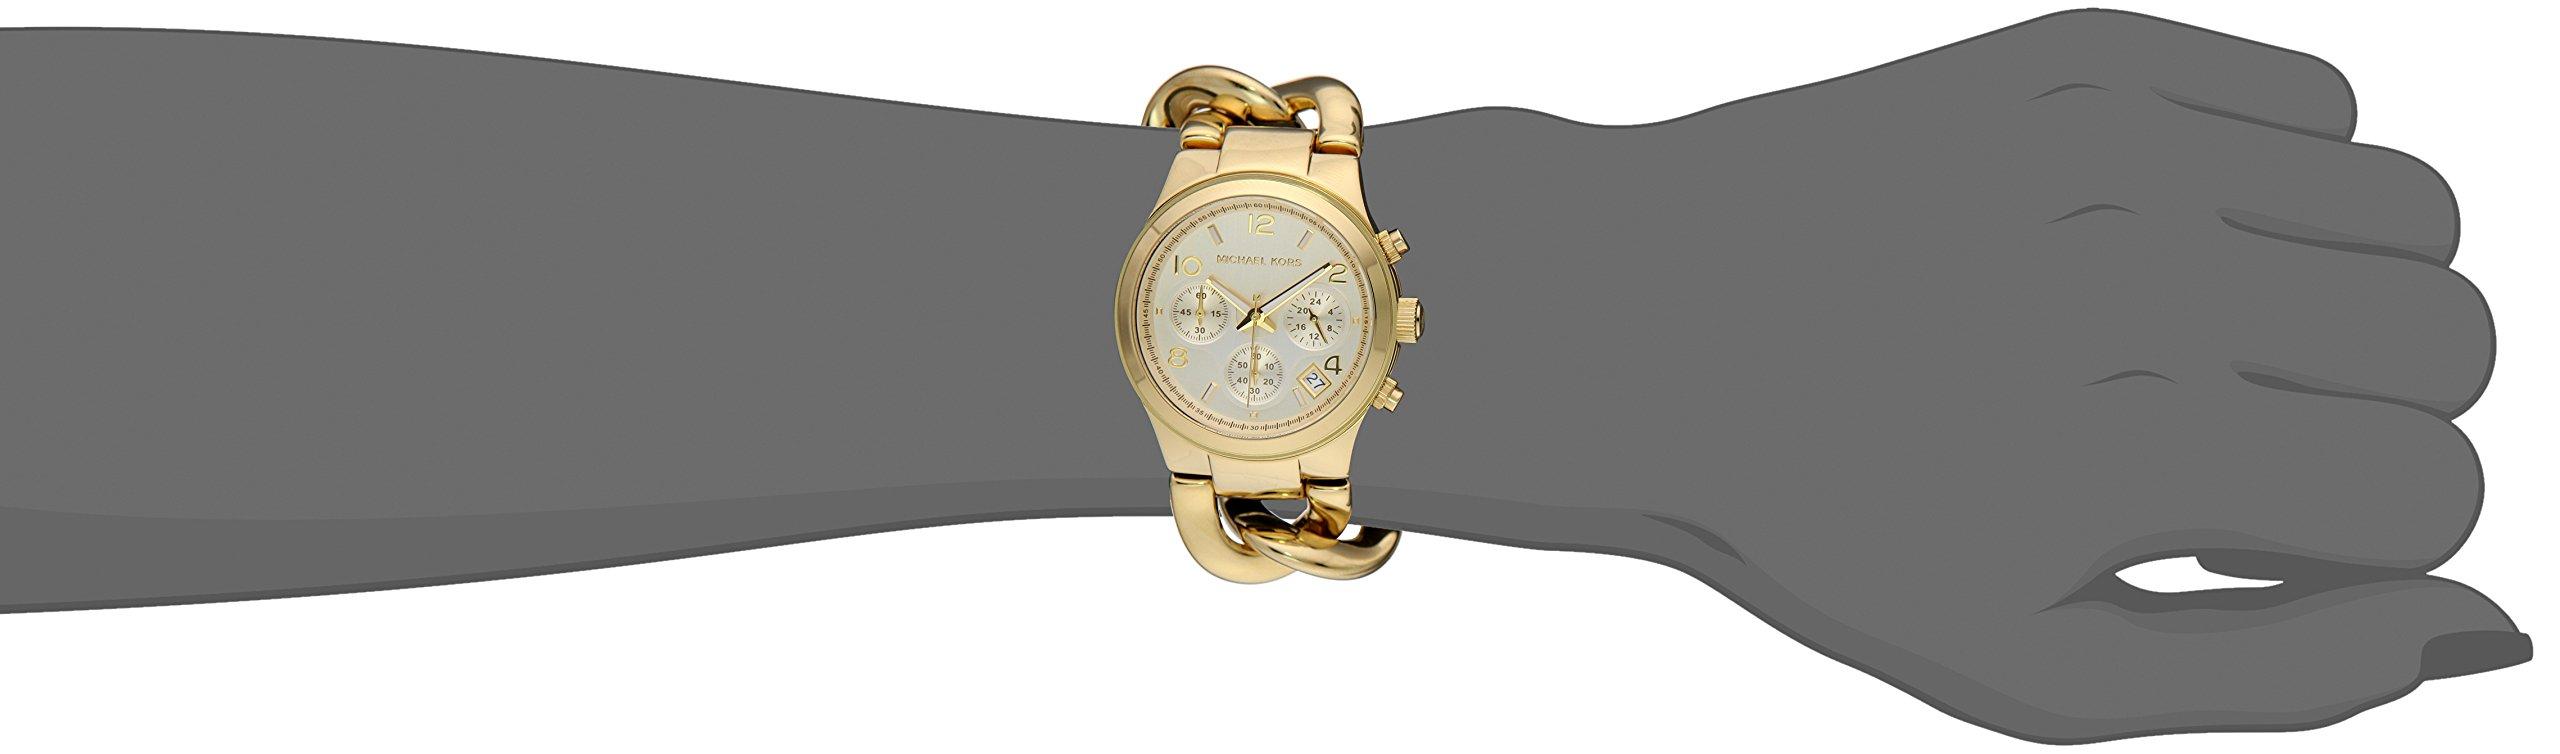 Michael Kors Women's Runway Gold-Tone Watch MK3131 by Michael Kors (Image #5)